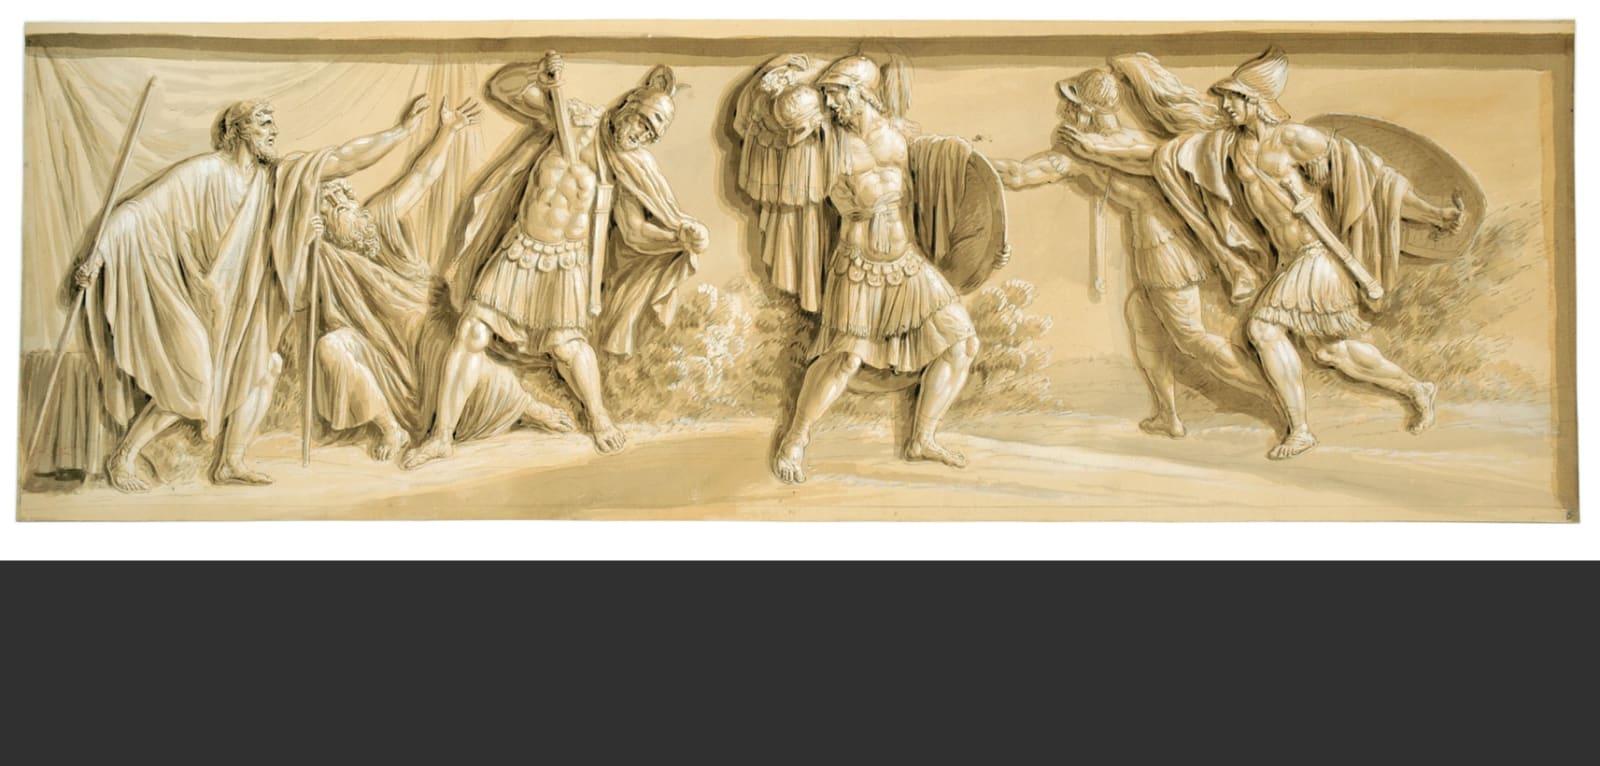 The metamorphoses of Ovid